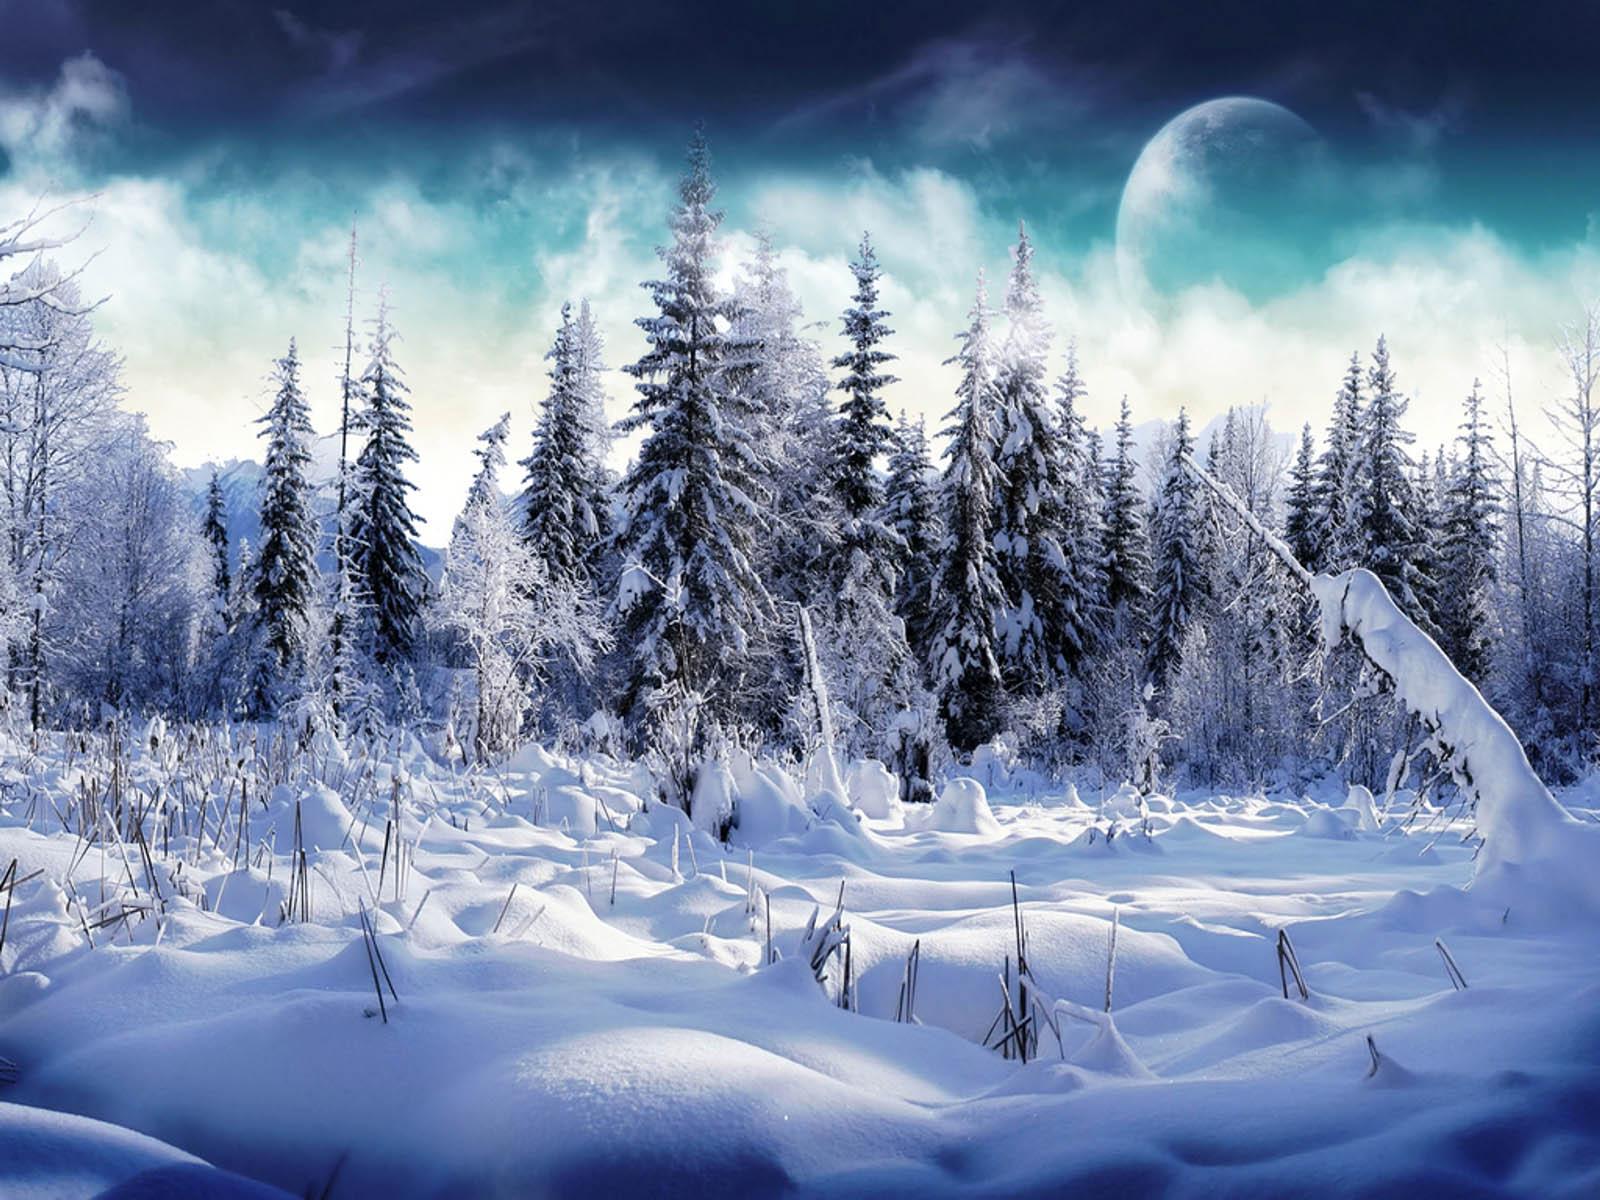 wallpaper Snow Desktop Wallpapers and Backgrounds 1600x1200